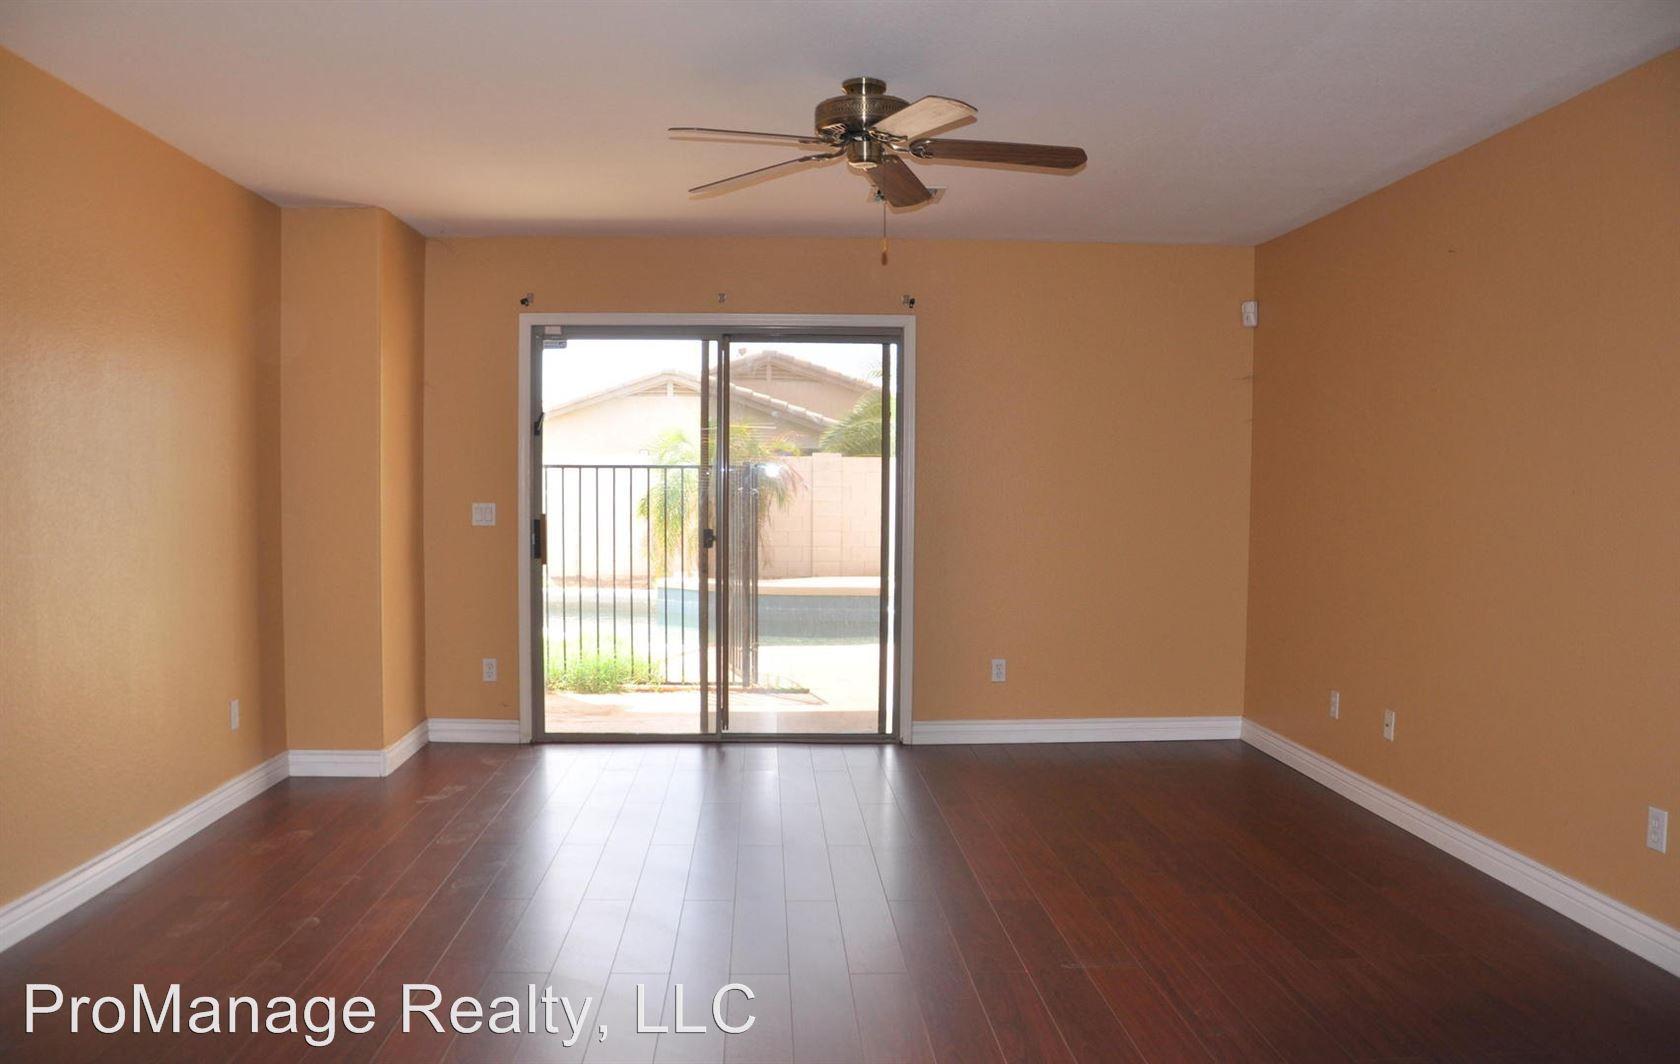 6035 w illini st phoenix az 85043 3 bedroom apartment for rent